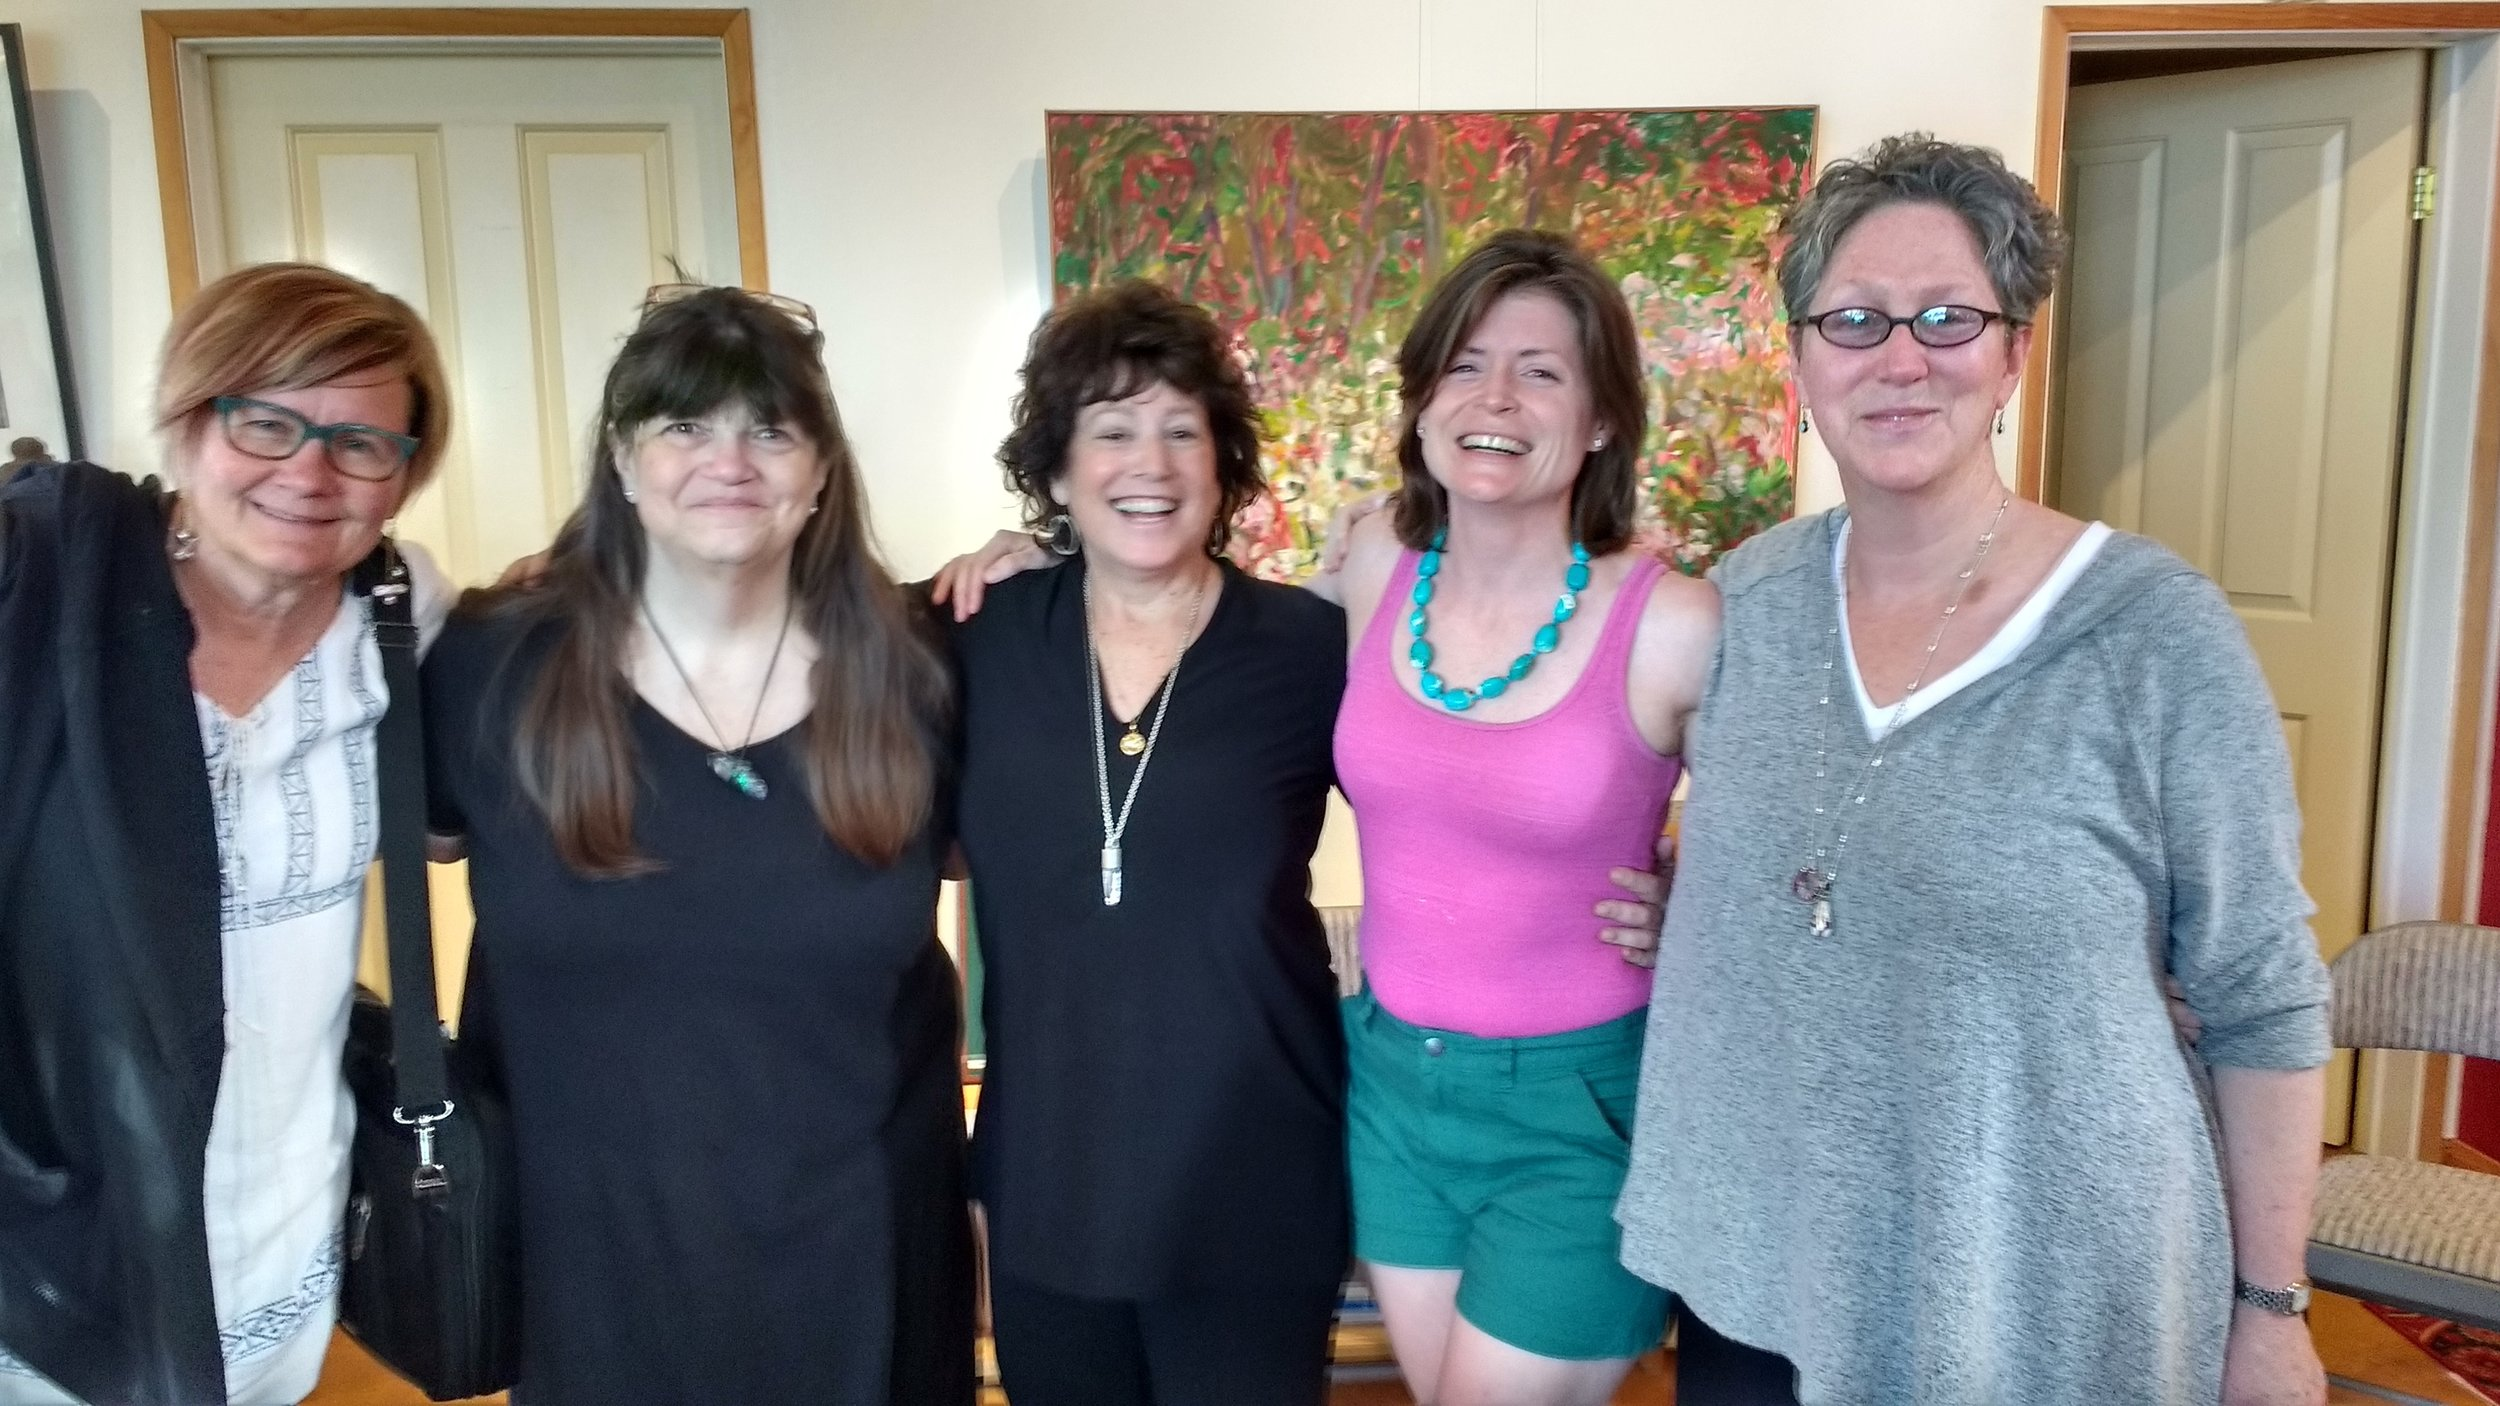 Linda Schreyer Charlotte Kaufman Amy Ferris.jpg